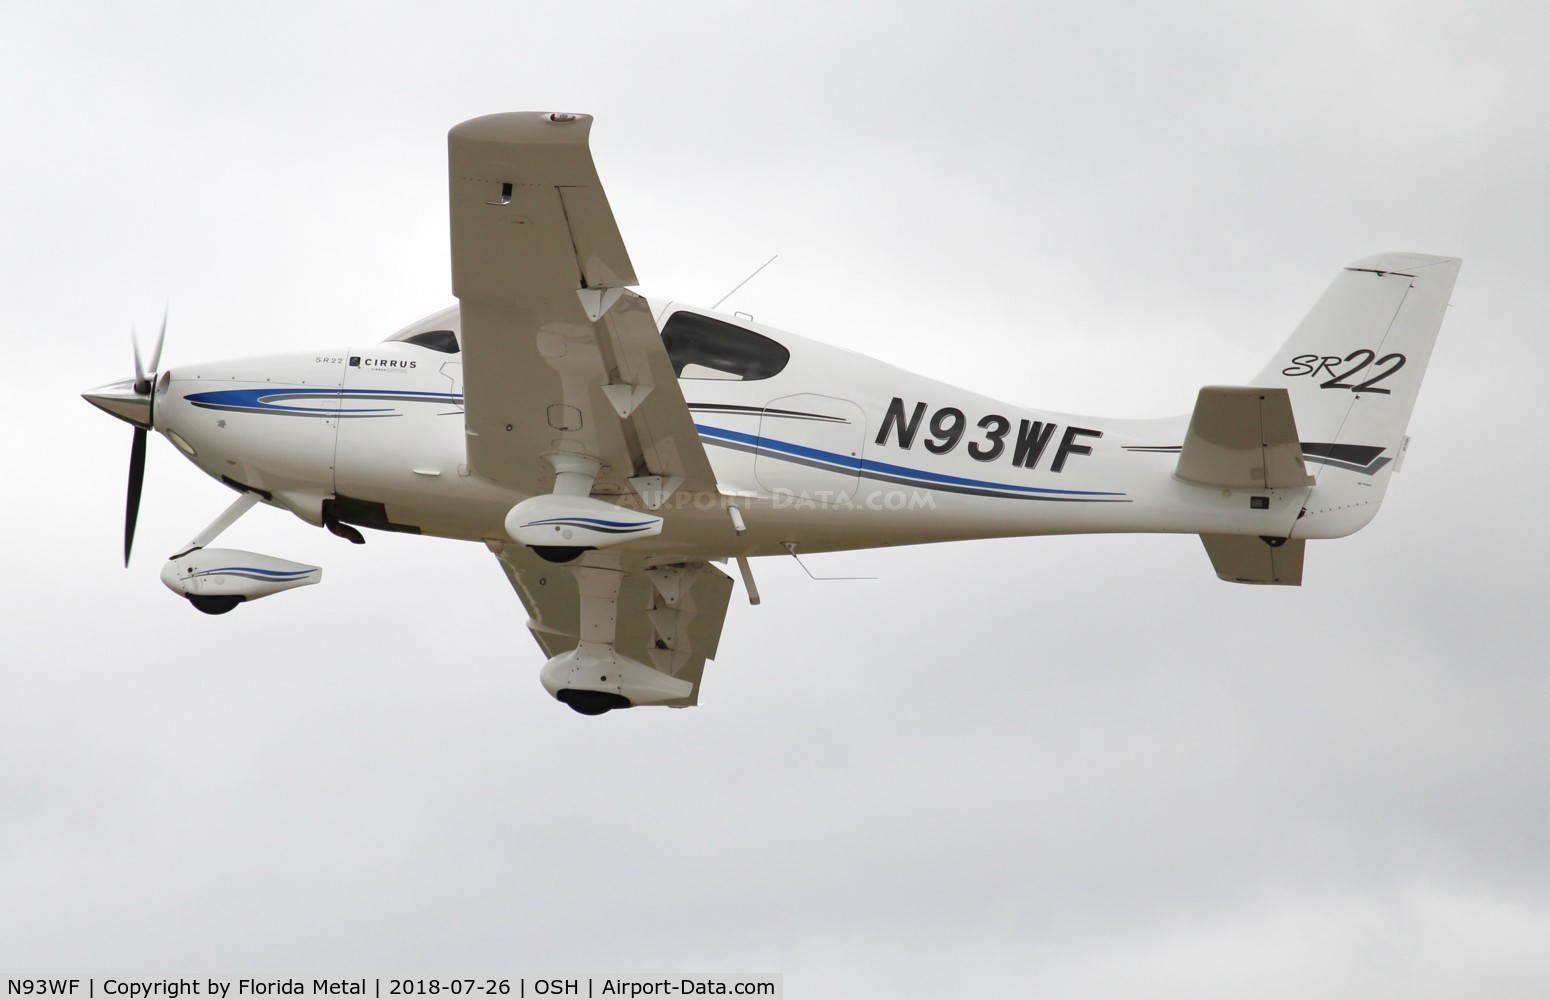 N93WF, 2001 Cirrus SR22 C/N 0087, Cirrus SR22